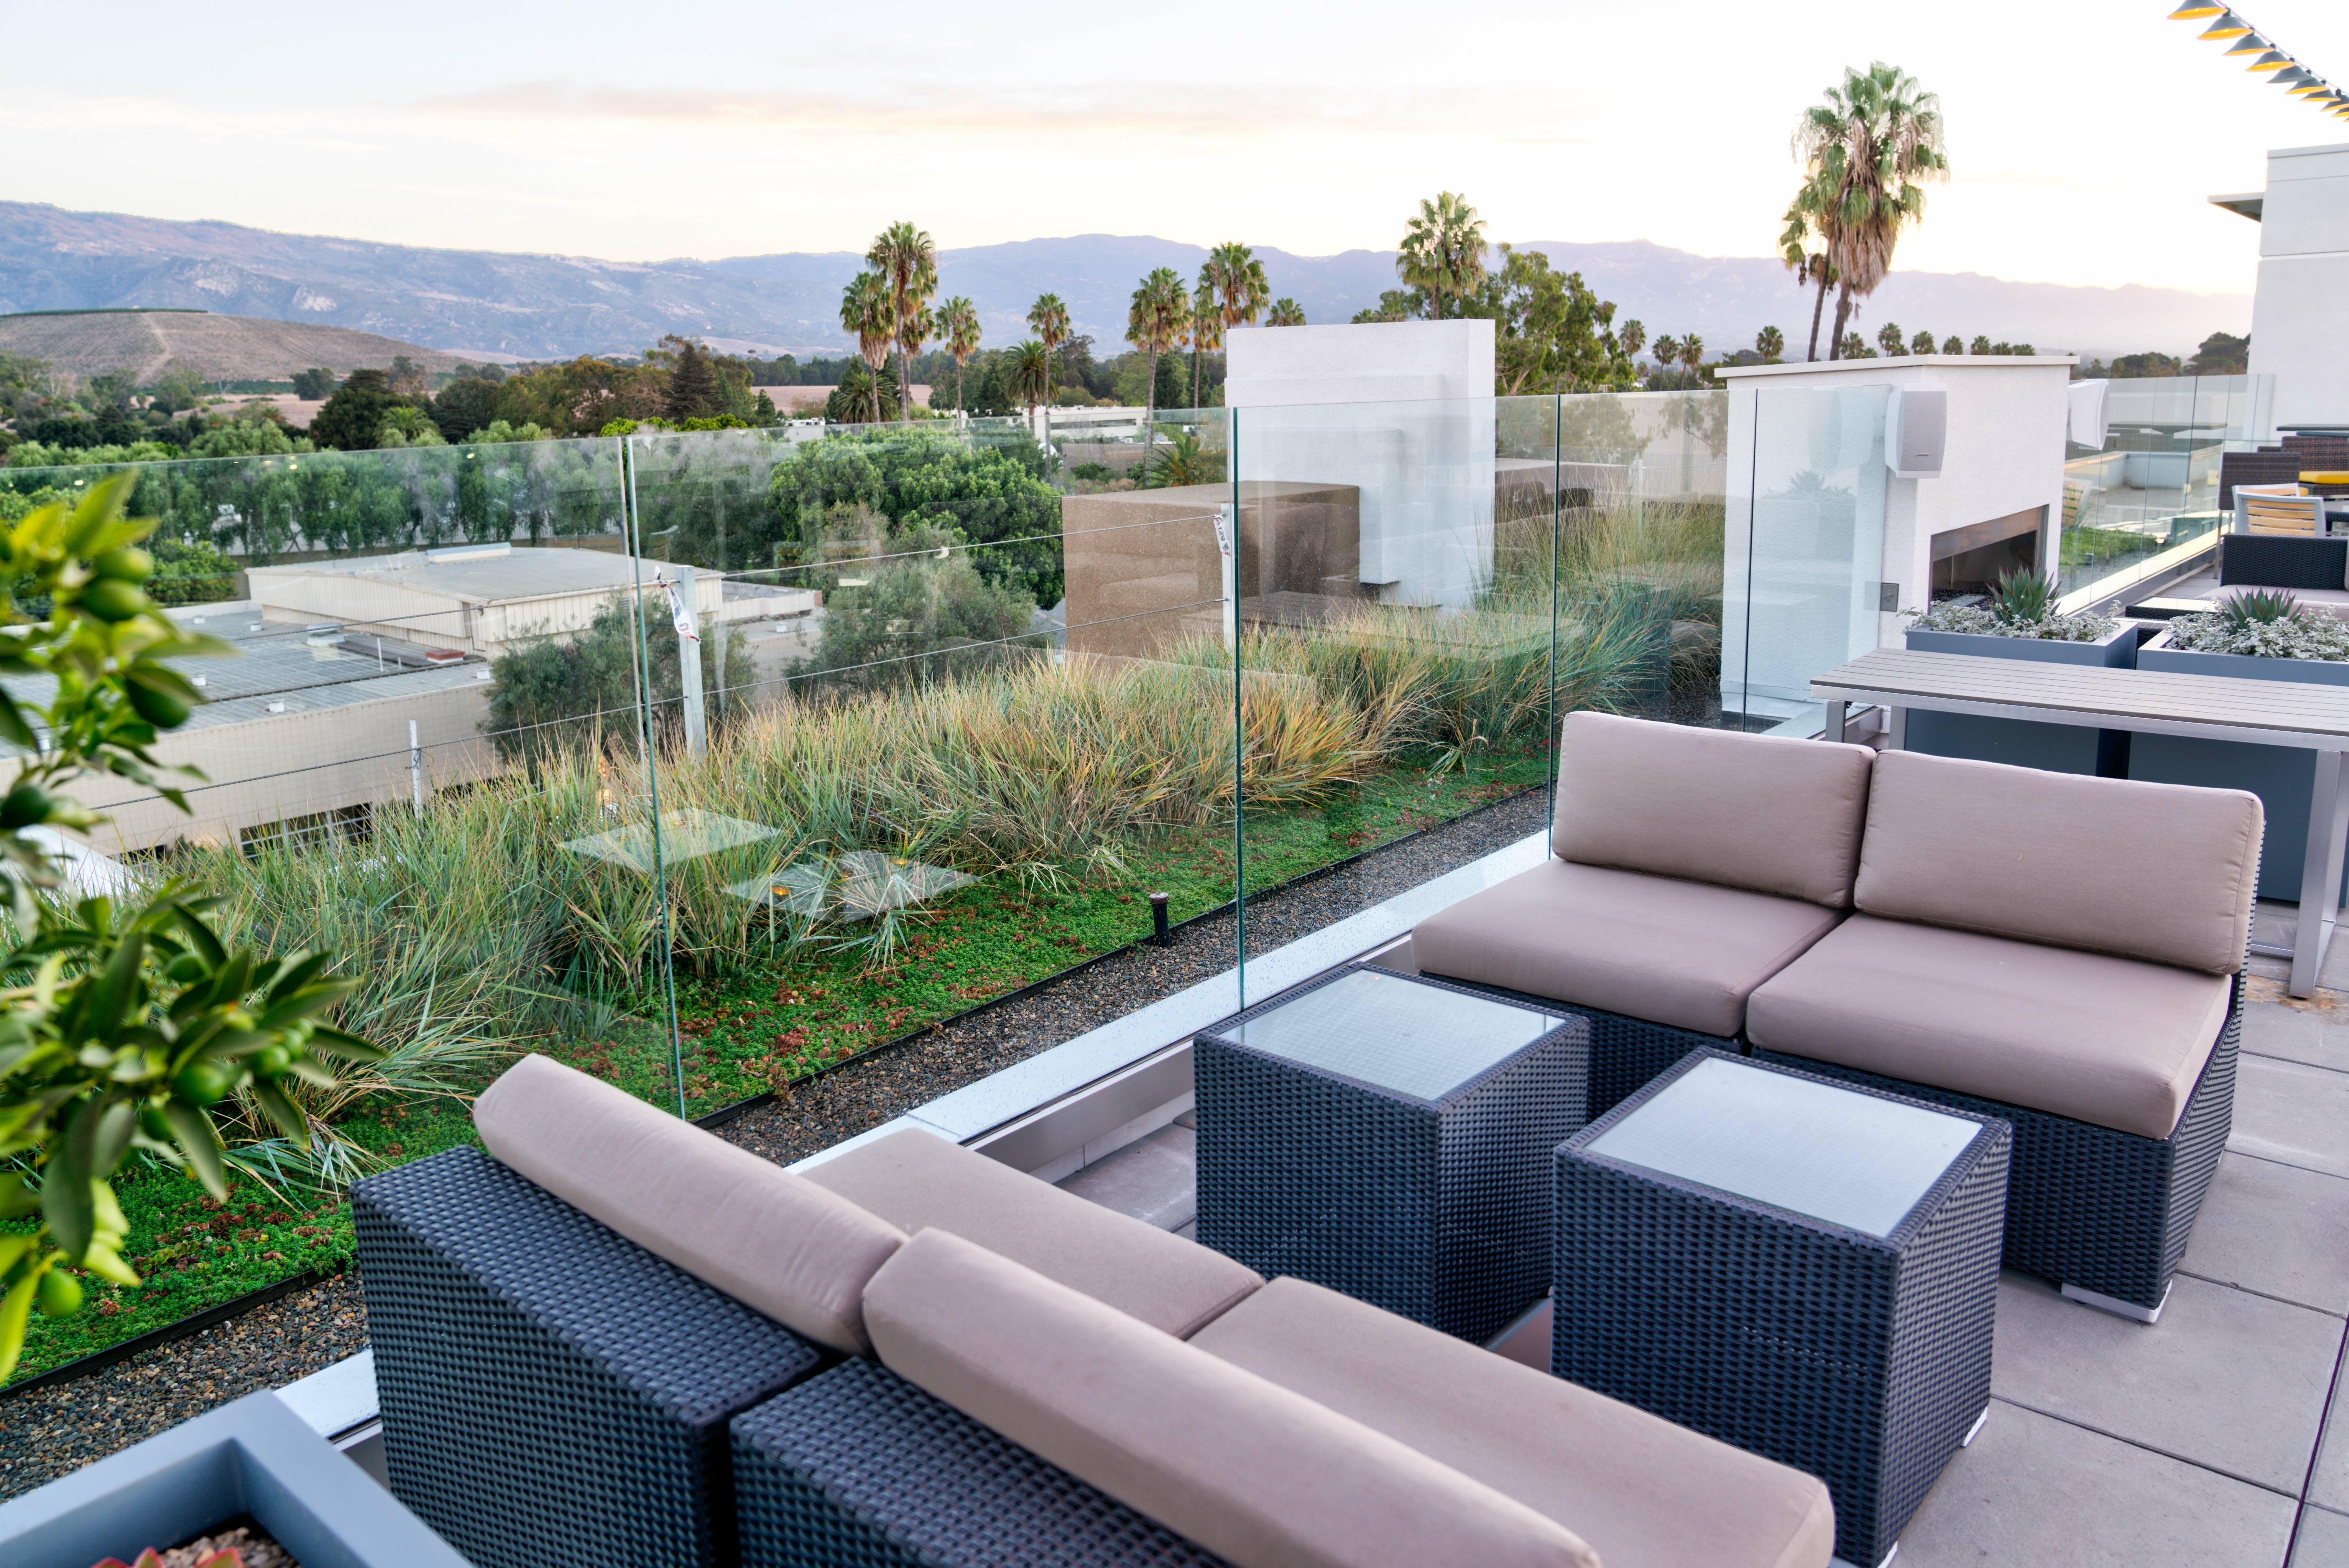 Fantastic Hilton Garden Inn Careers Images - Beautiful Garden - dlix.us